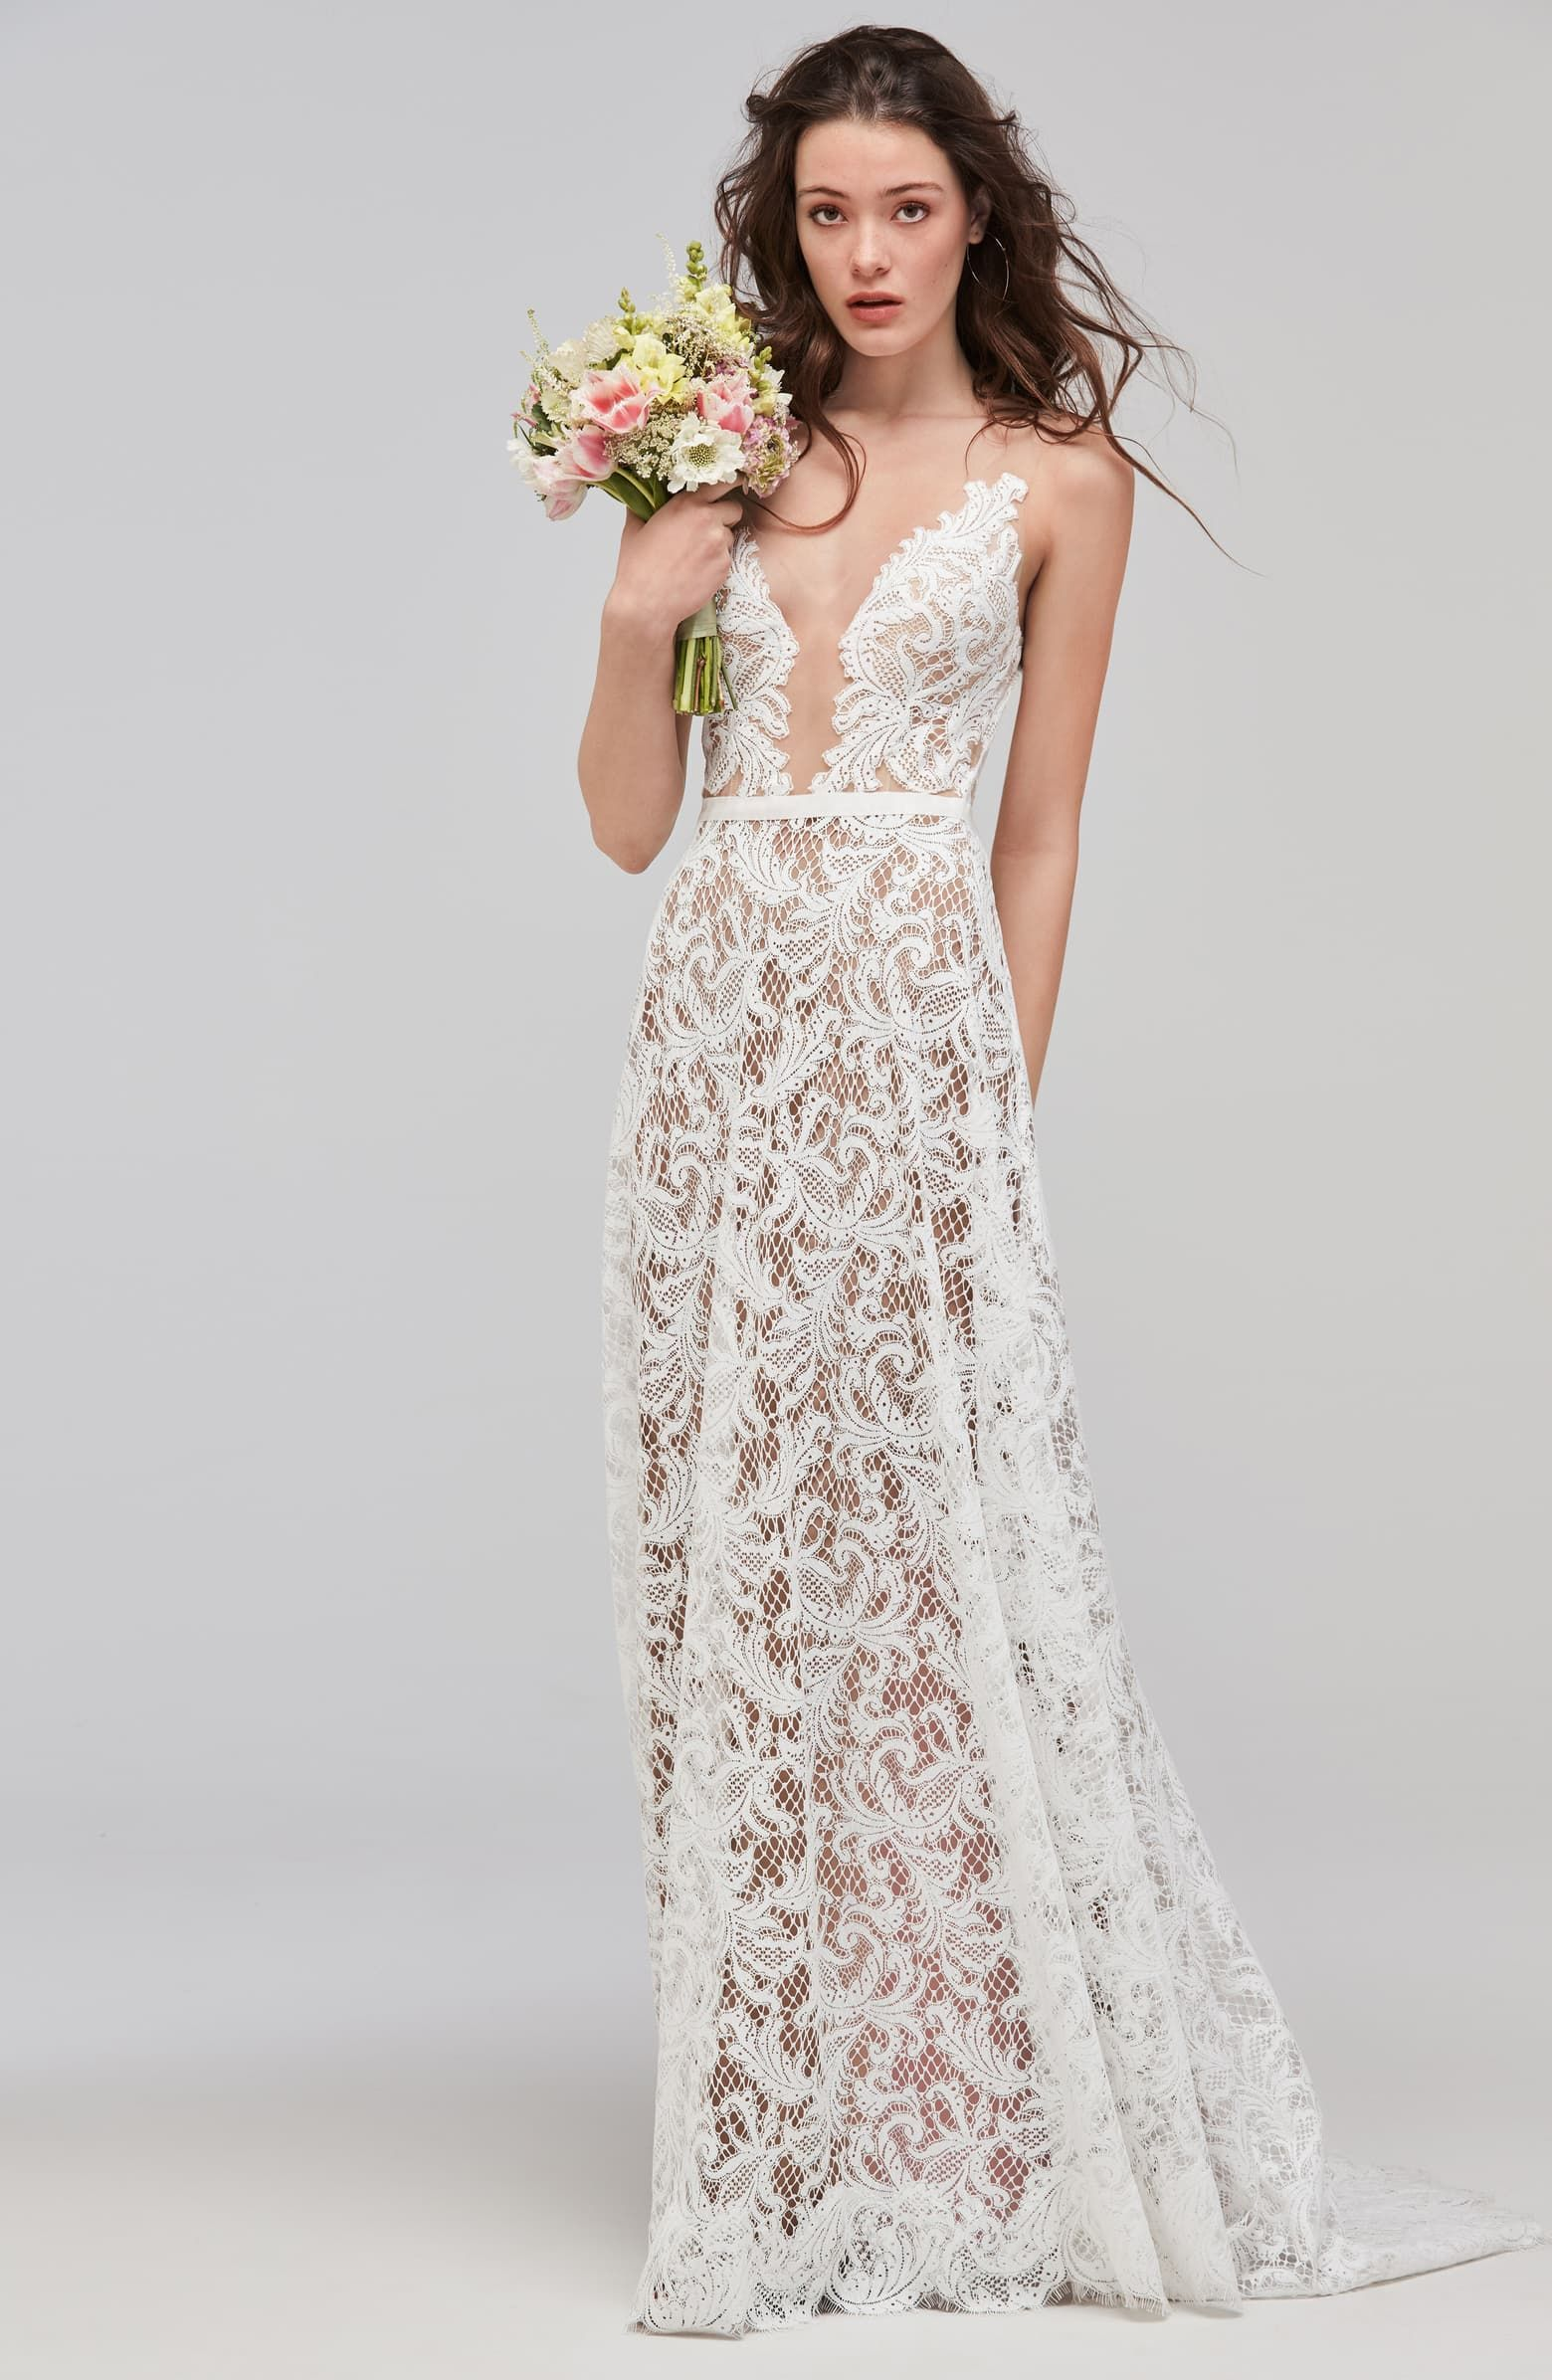 Willowby Asa Sleeveless V Neck Lace Tulle Wedding Dress En 2020 Mariage